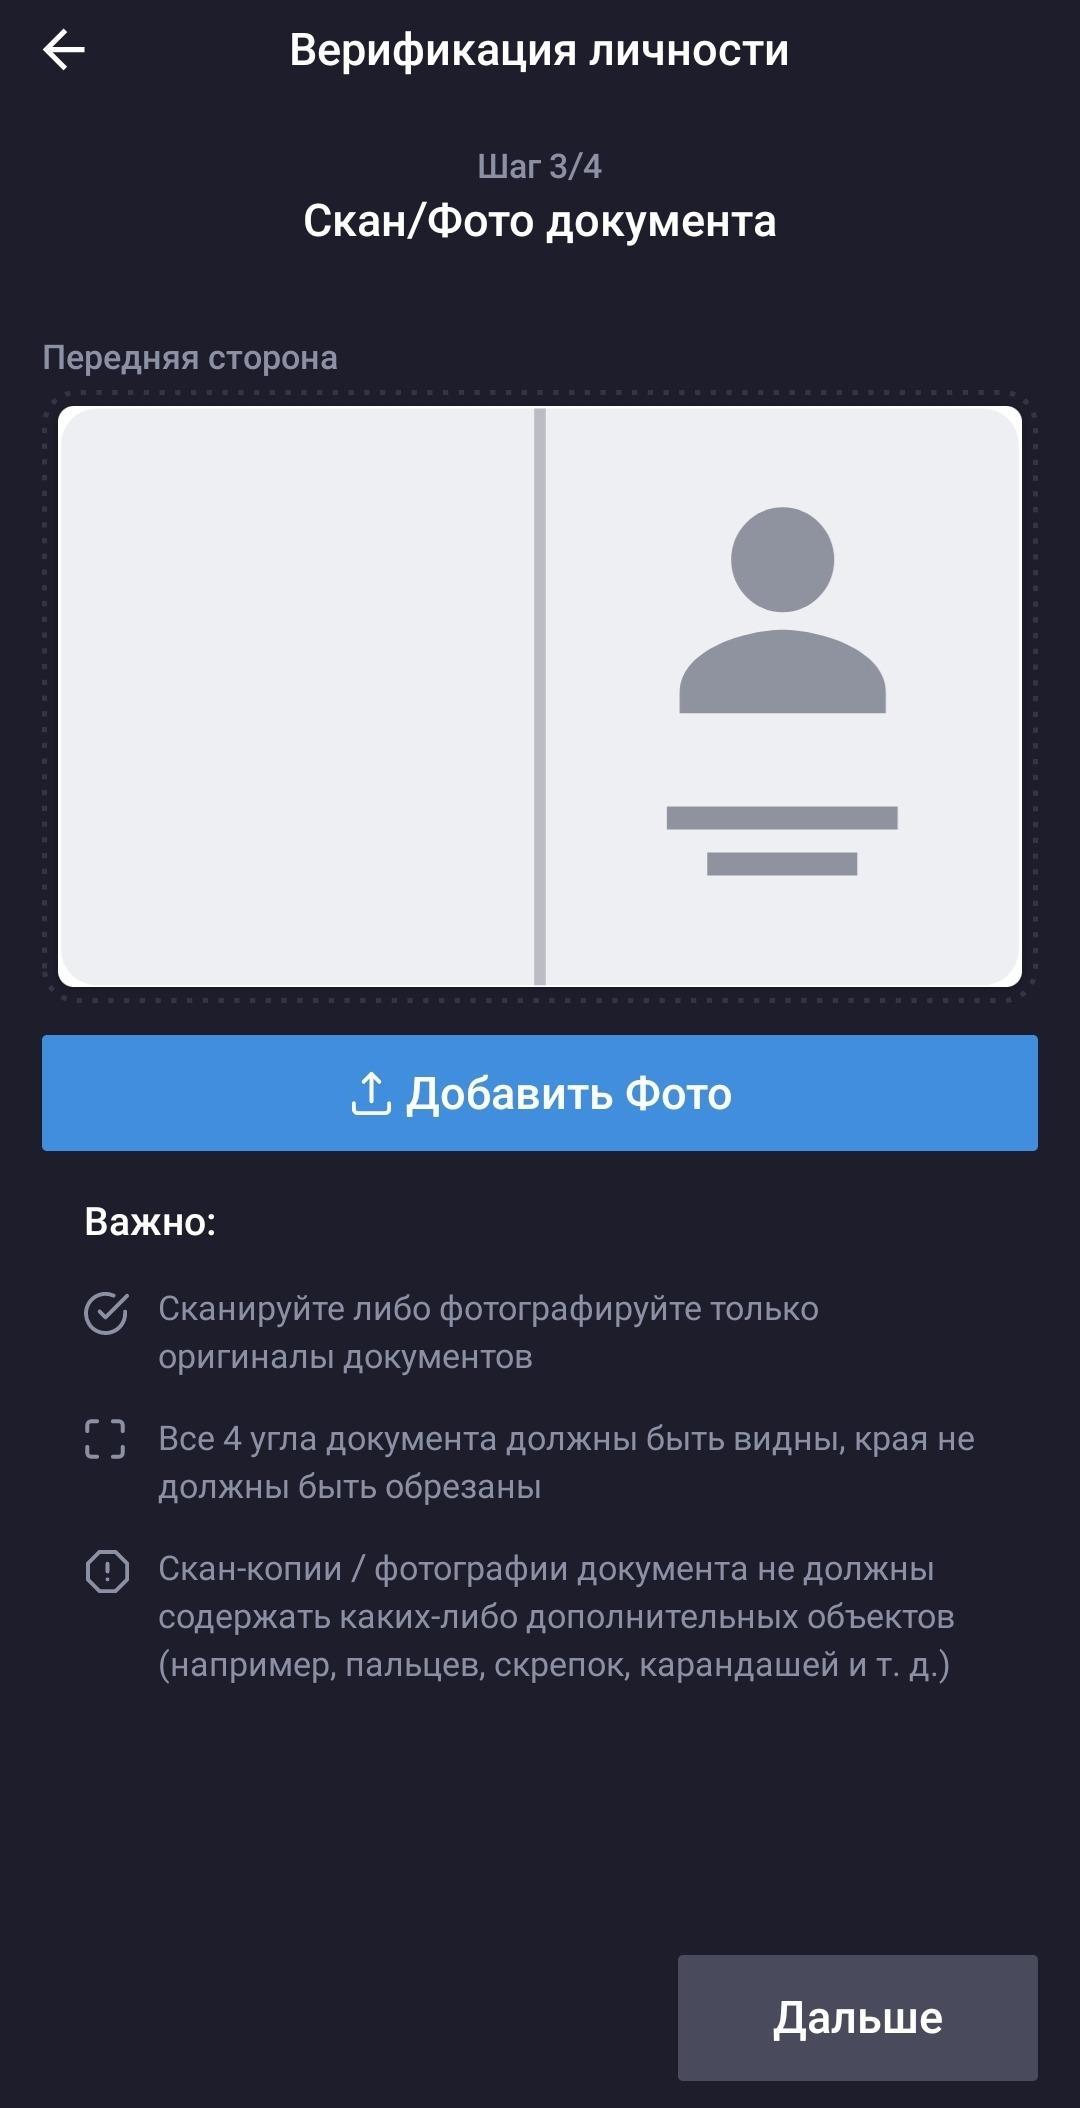 Верификация личности шаг 3